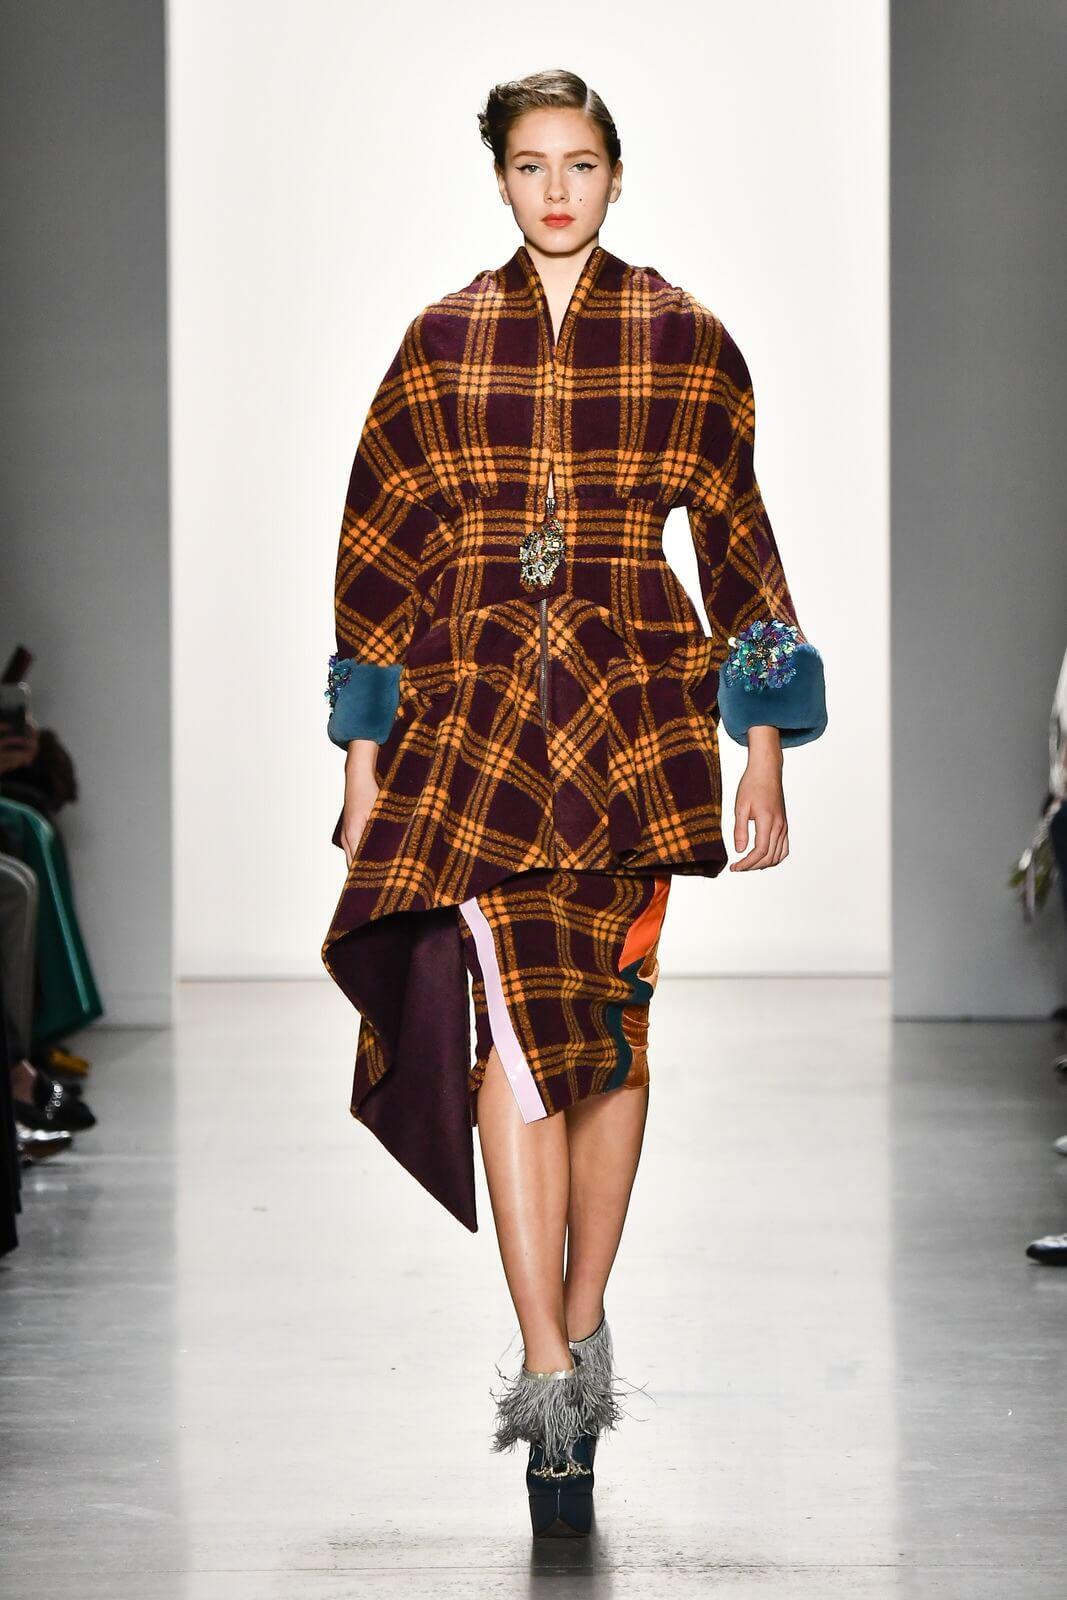 NYFW, #nyfw, new york fashion week, son jung wan, @sonjungwan, #sonjungwan, predupre, @predupre, NYFW the Shows, NYFW F/W 2019, women's apparel, women's fashion, women's fall fashion, women's winter fashion, fashion collection, fall fashion trends, winter fashion trends, #runway, #runwaymodel, Son Jung Wan F/W 2019, #nyc, #runway, fall trends 2019, fall style 2019, winter trends 2019, winter style 2019